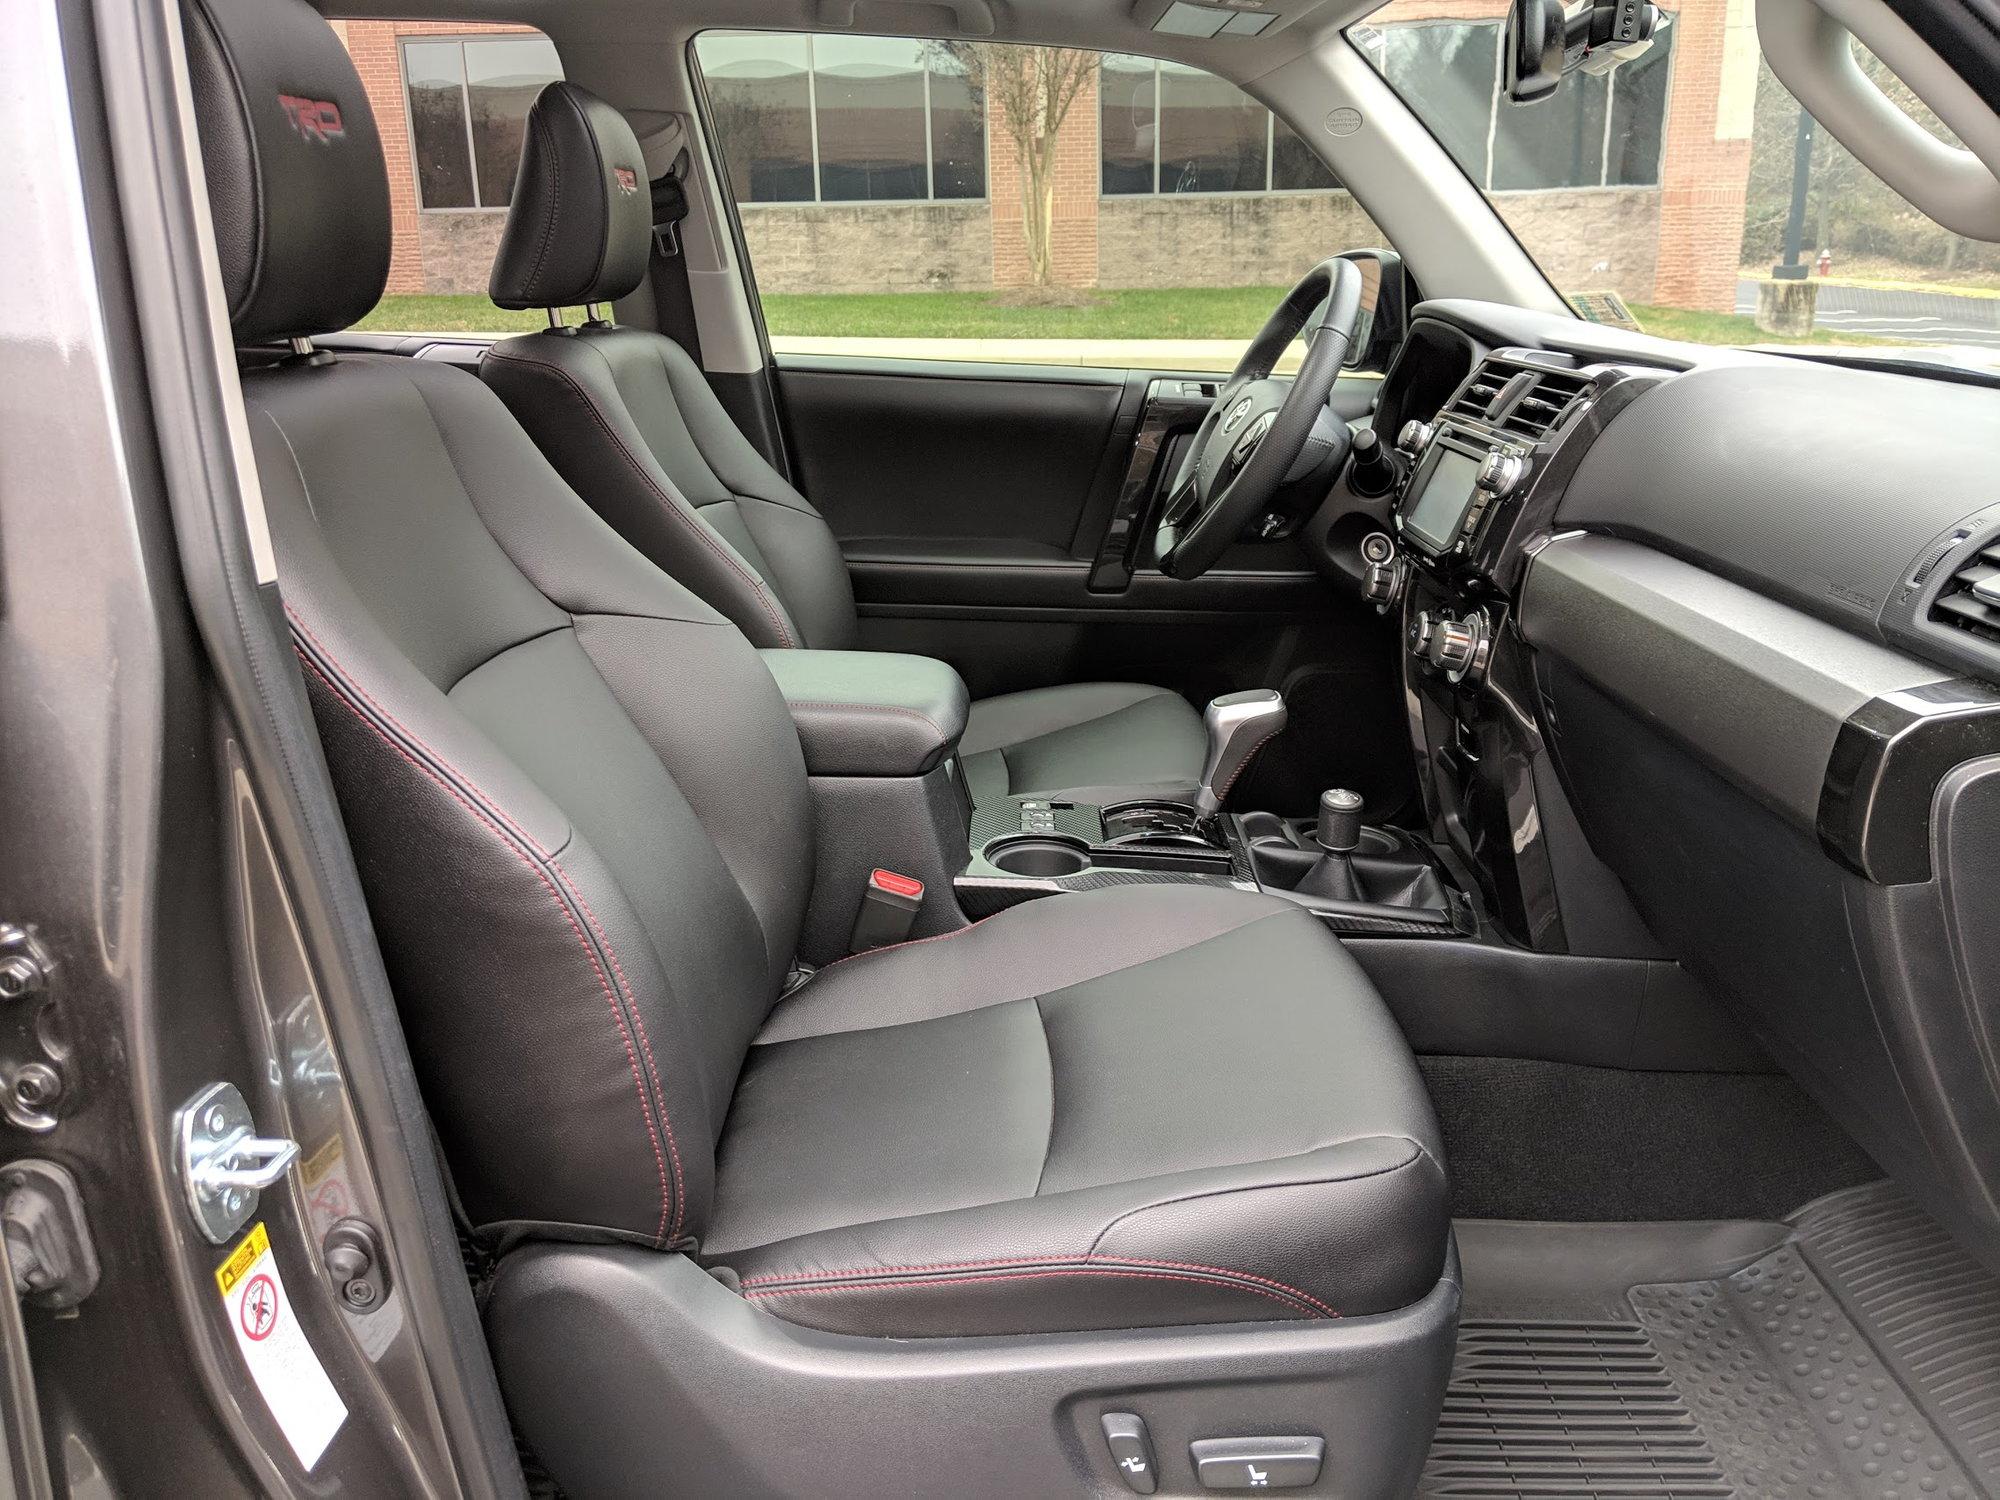 2017 Toyota 4Runner - Off Road Premium - KDSS - TRD - Low